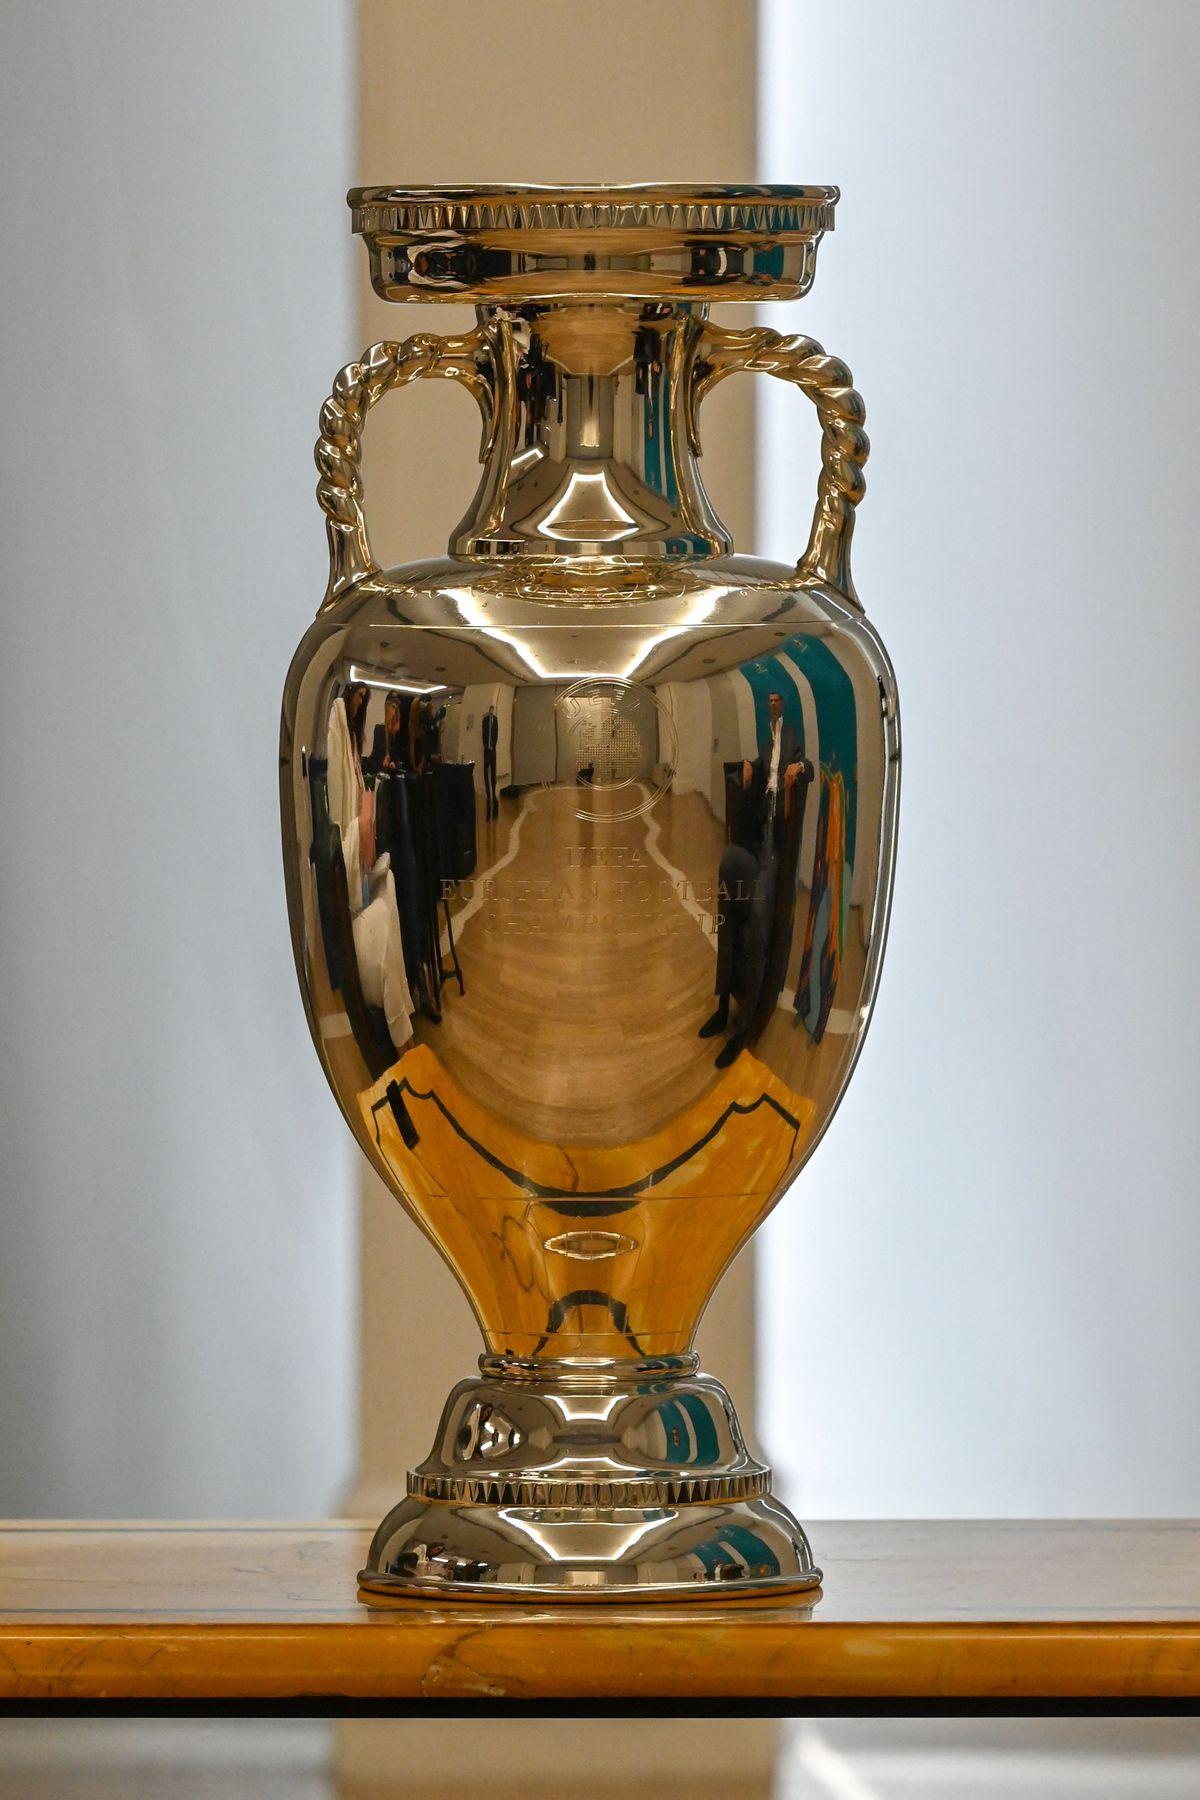 FBL-EURO-2020-2021-TROPHY